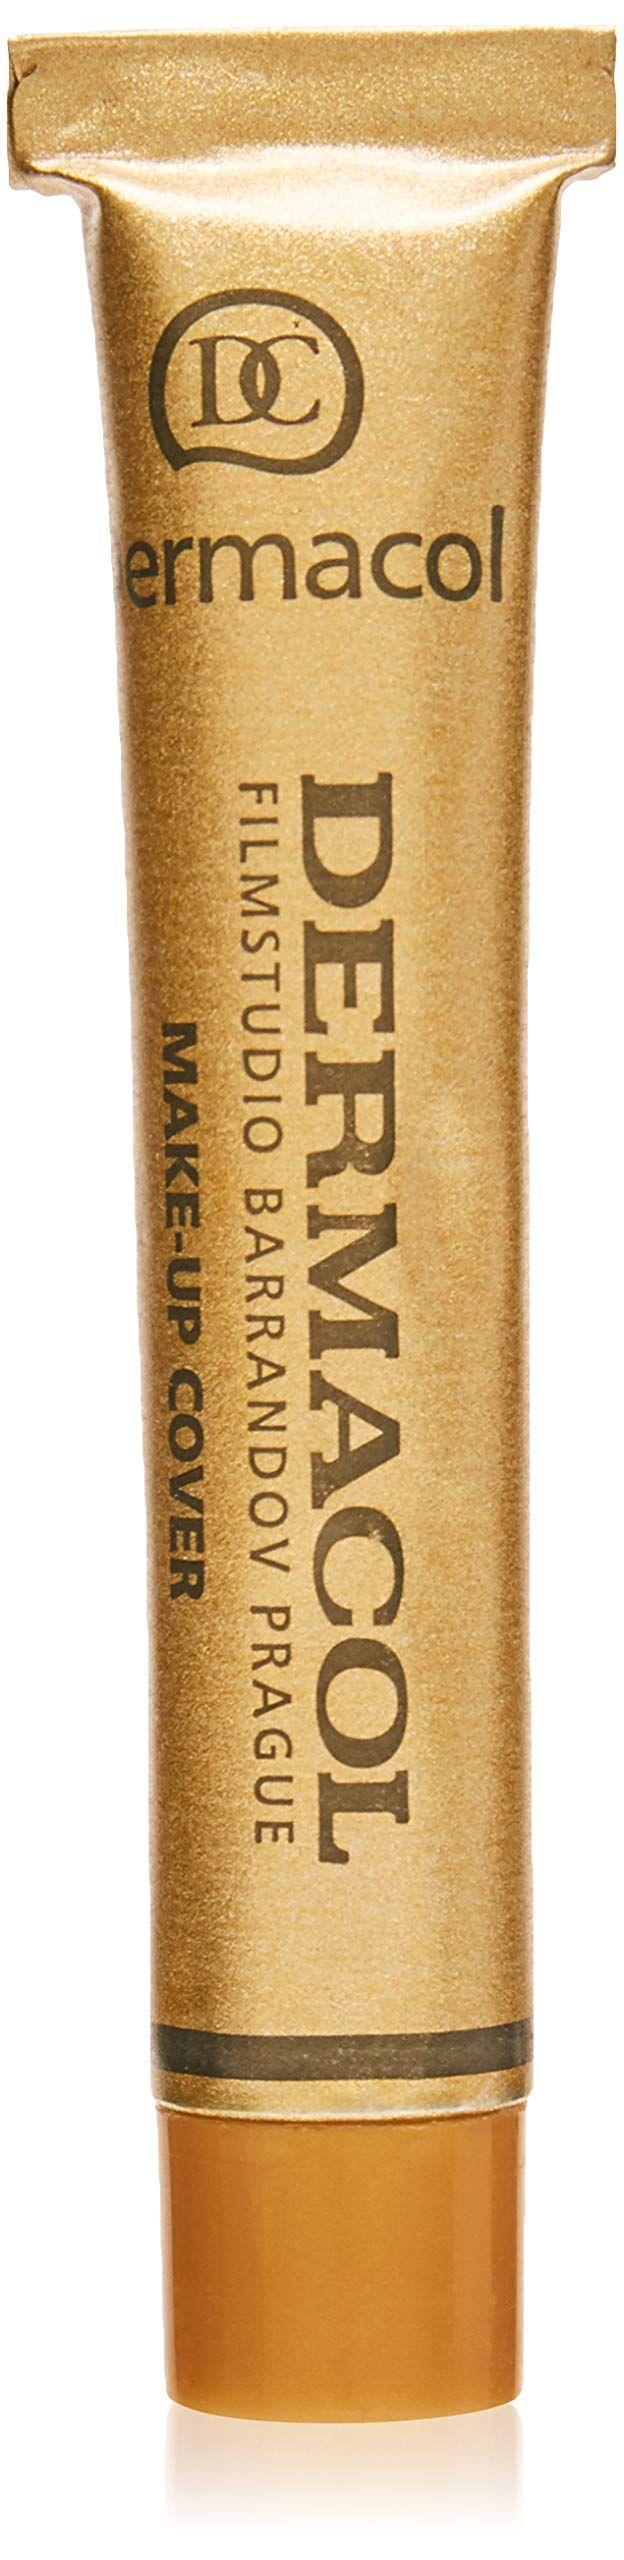 ديرما كول MakeUp Cover 30 g, 222 مكياج الامارات دبي